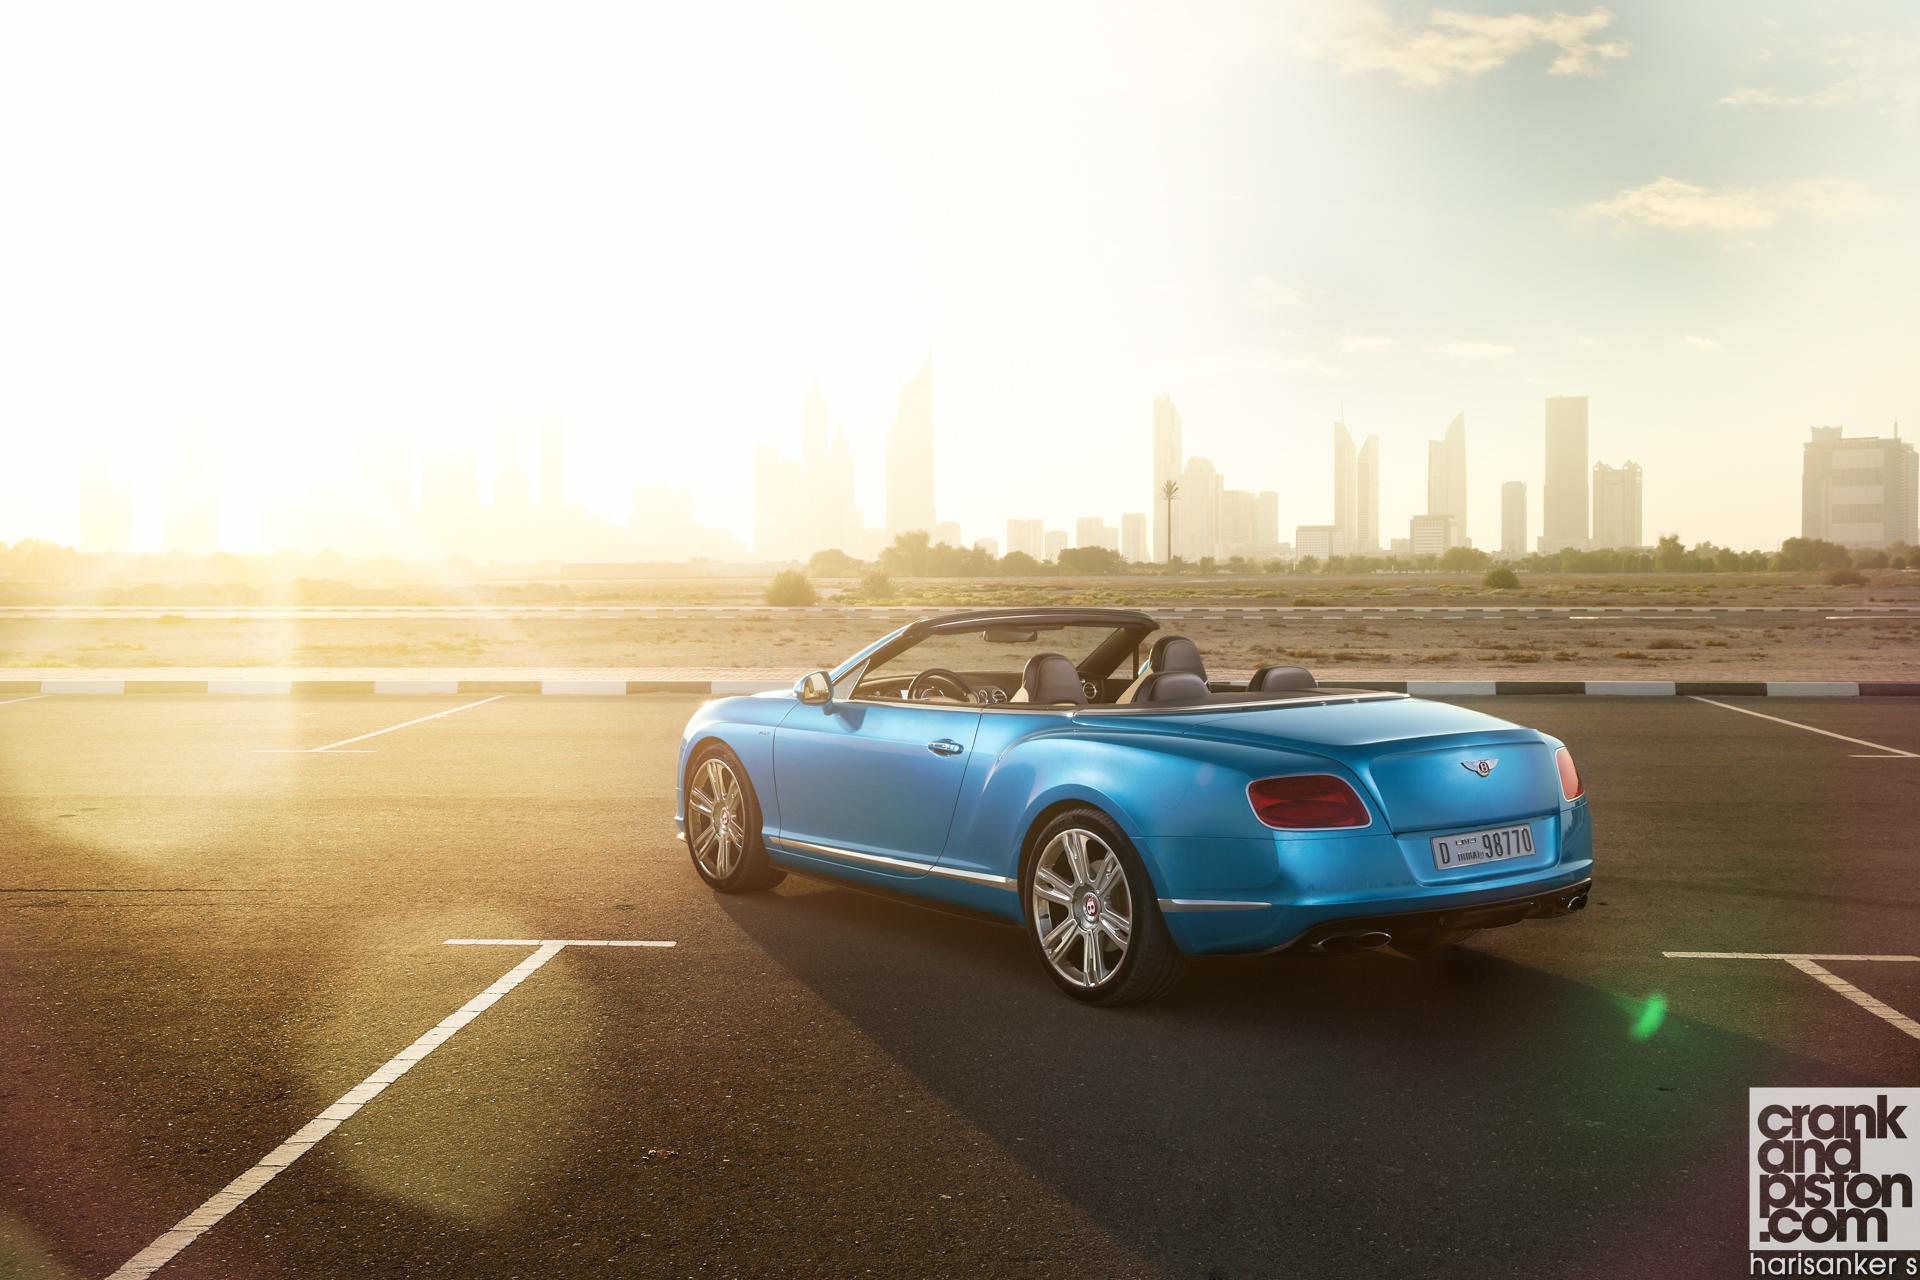 Bentley Continental GT V8 S crankandpiston Wallpapers-4